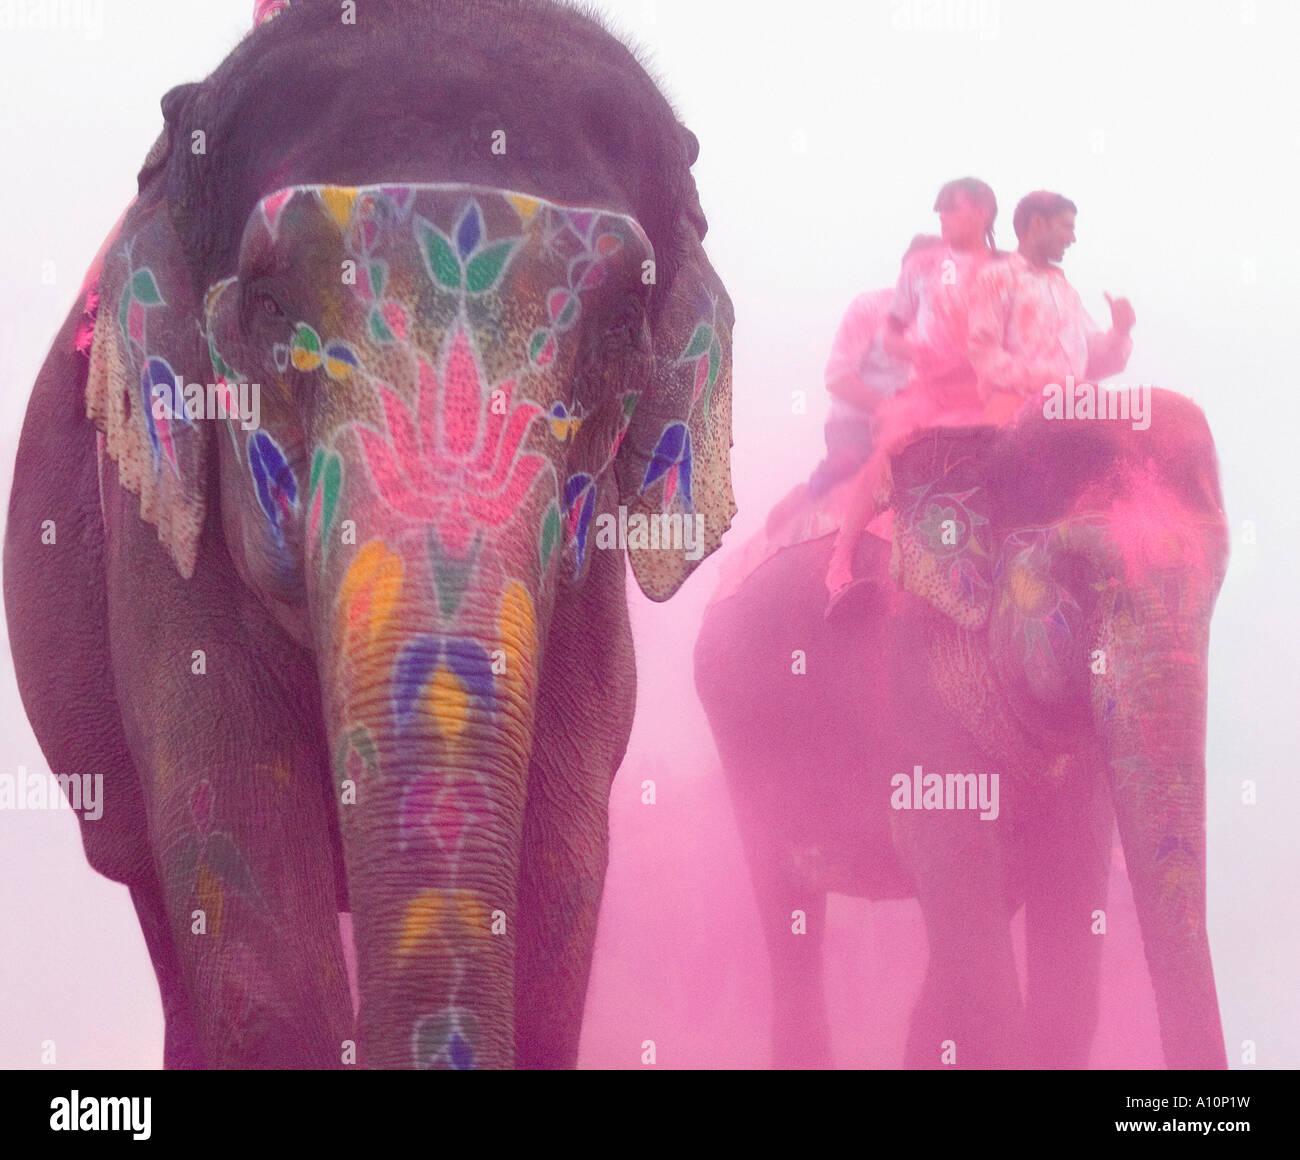 Tre elefanti a un festival di elefante, Jaipur, Rajasthan, India Immagini Stock